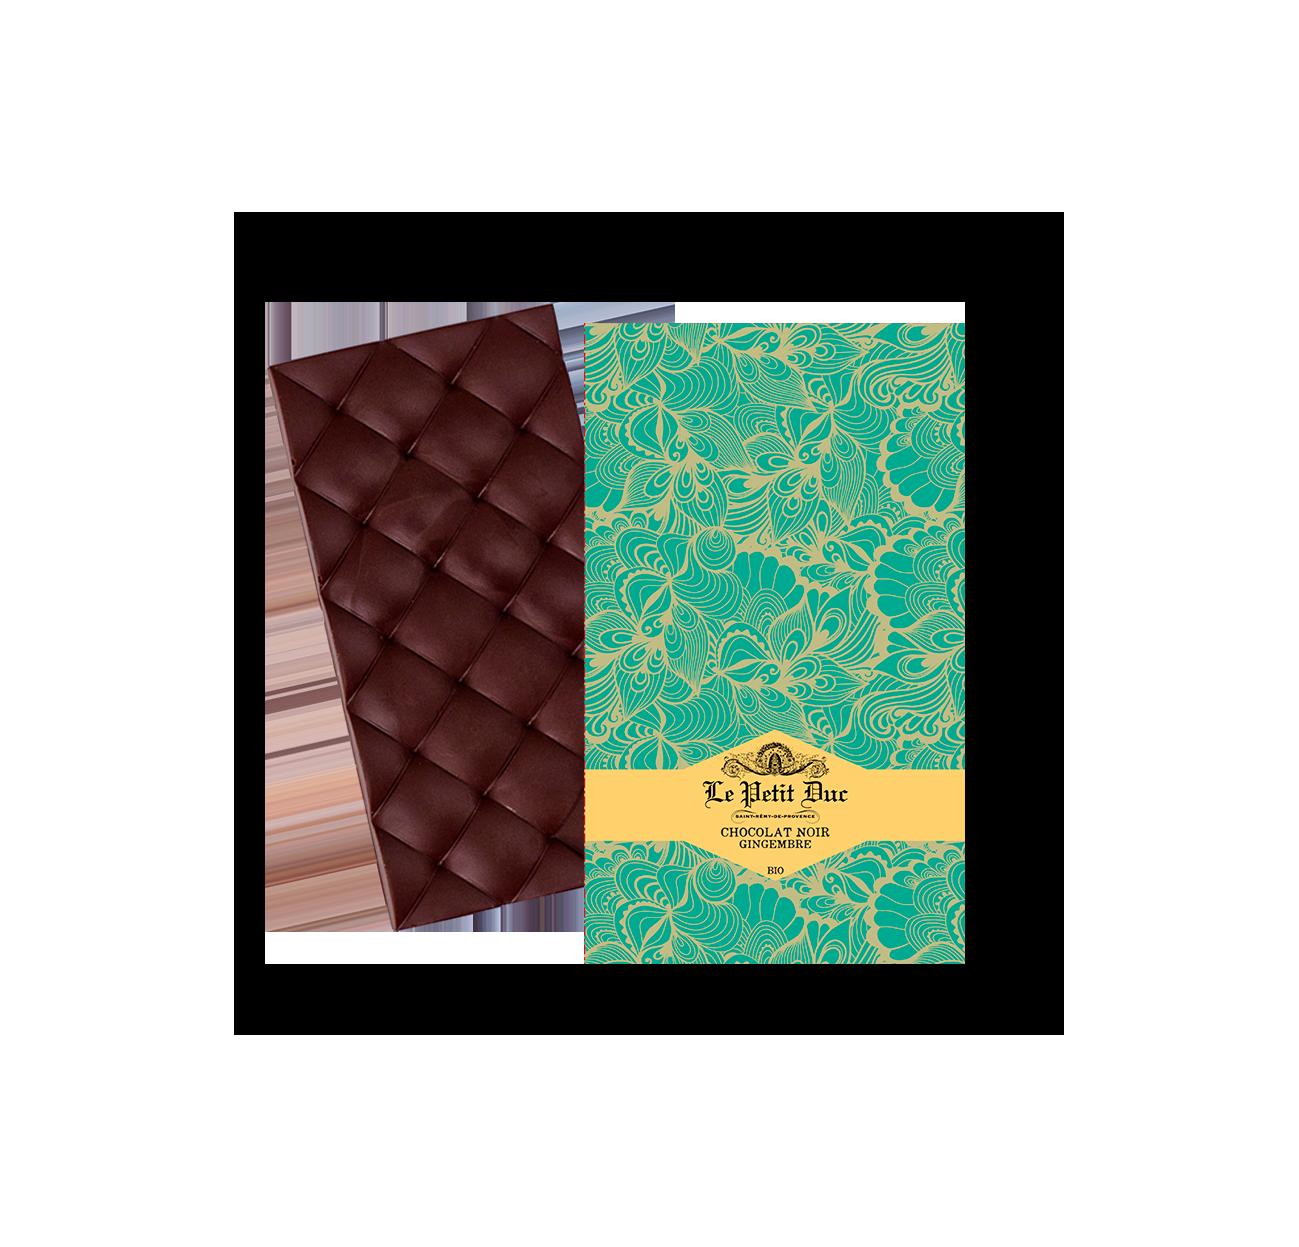 15/ Mørk sjokolade med ingefær, 70g - Le Petit Duc